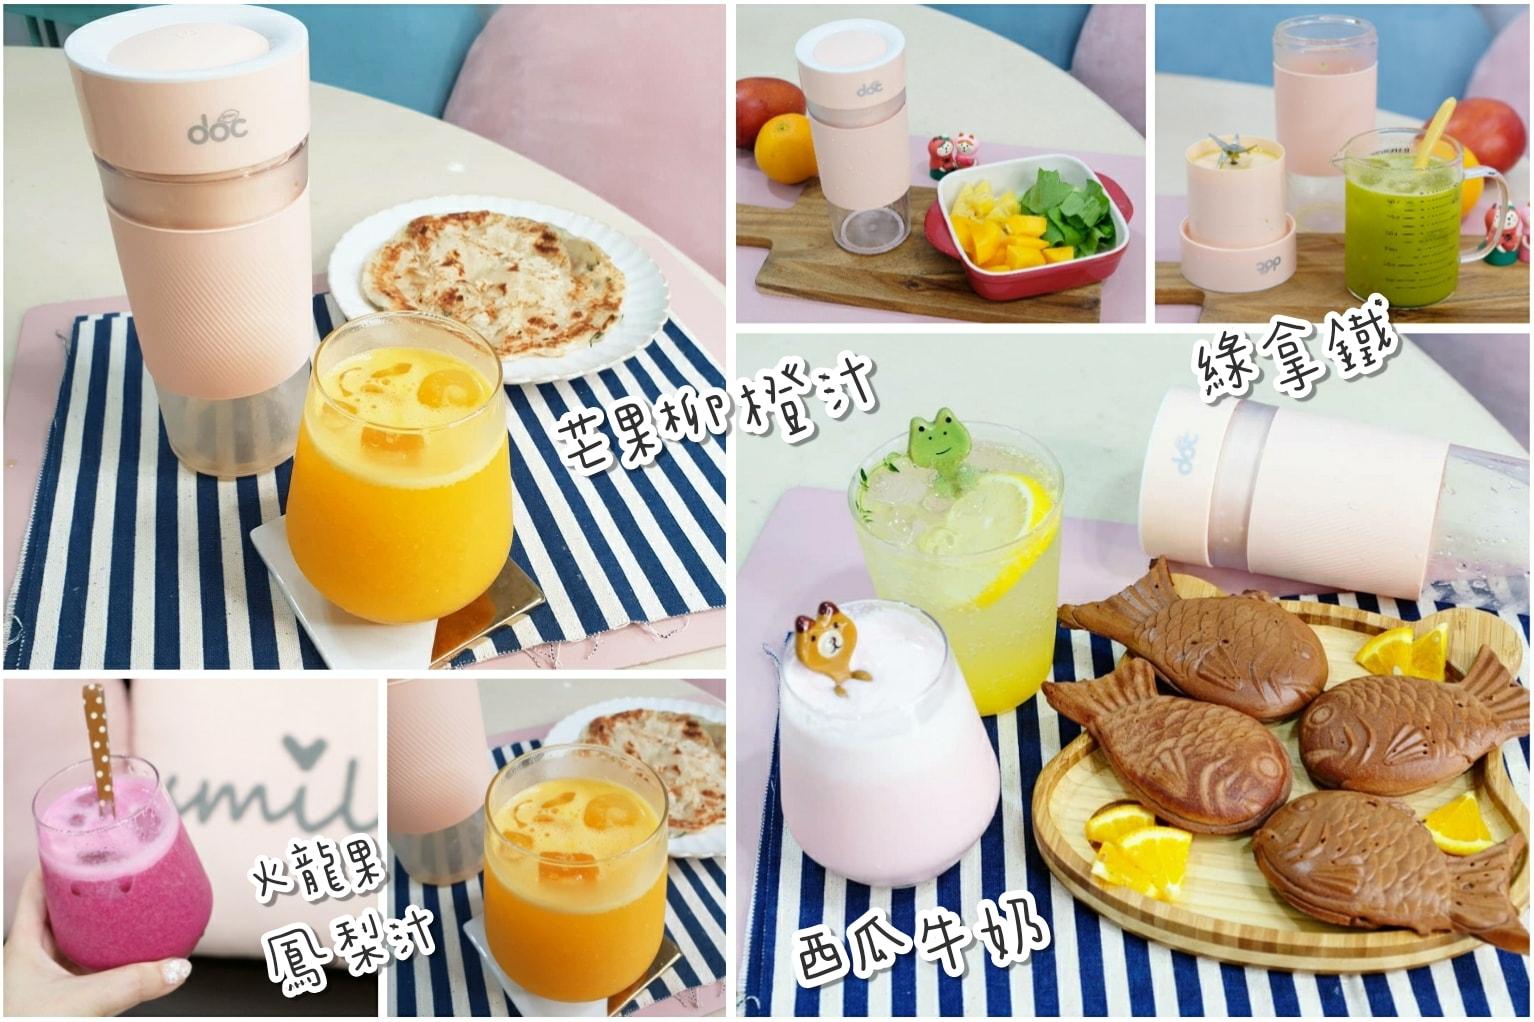 【Doc Green 輕享杯】超夠力USB充電隨身果汁杯/3D立體304不鏽鋼刀片/Tritan食品級材質 - yukiblog.tw